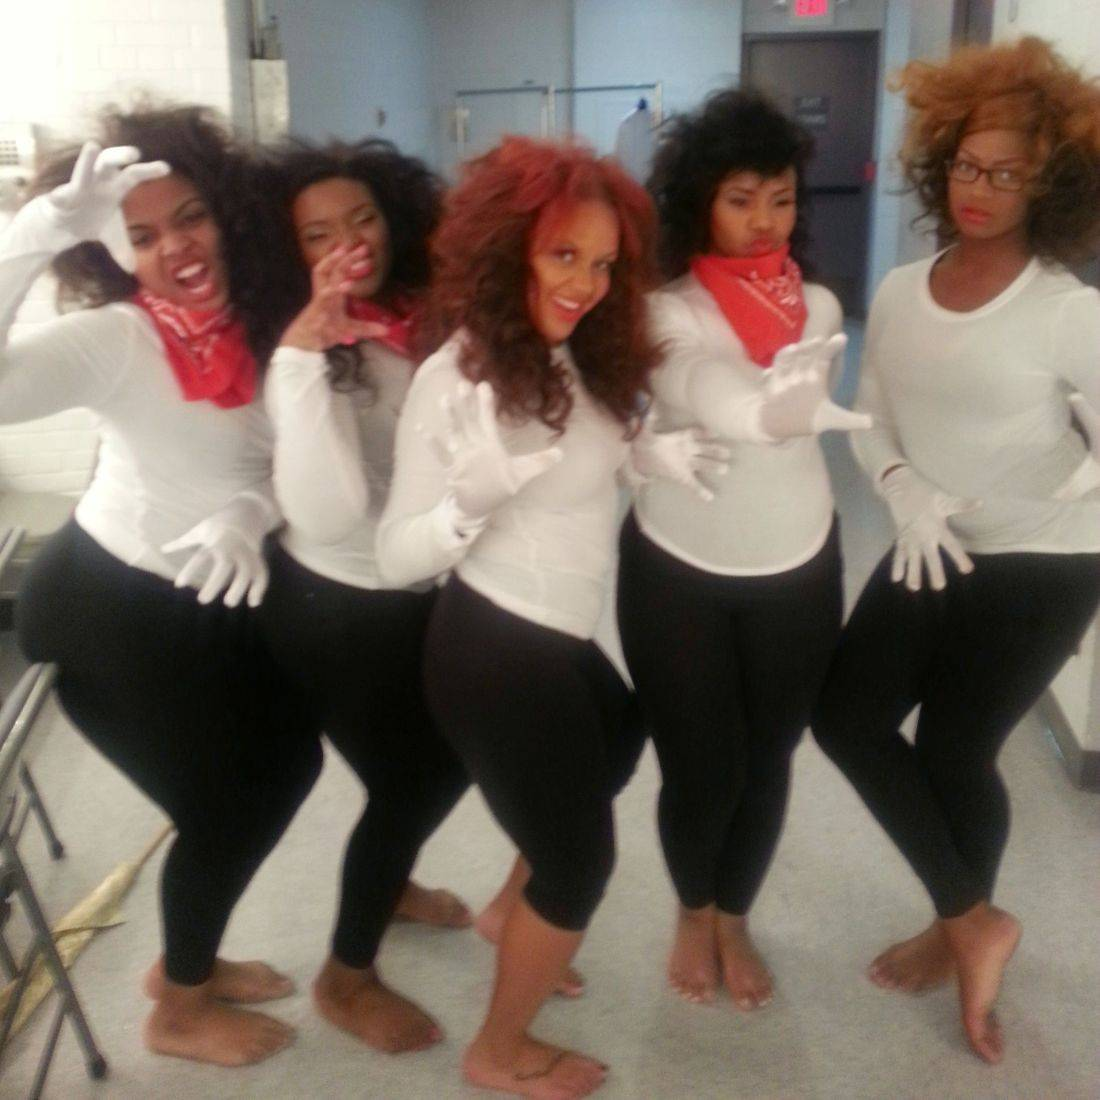 A group of ladies